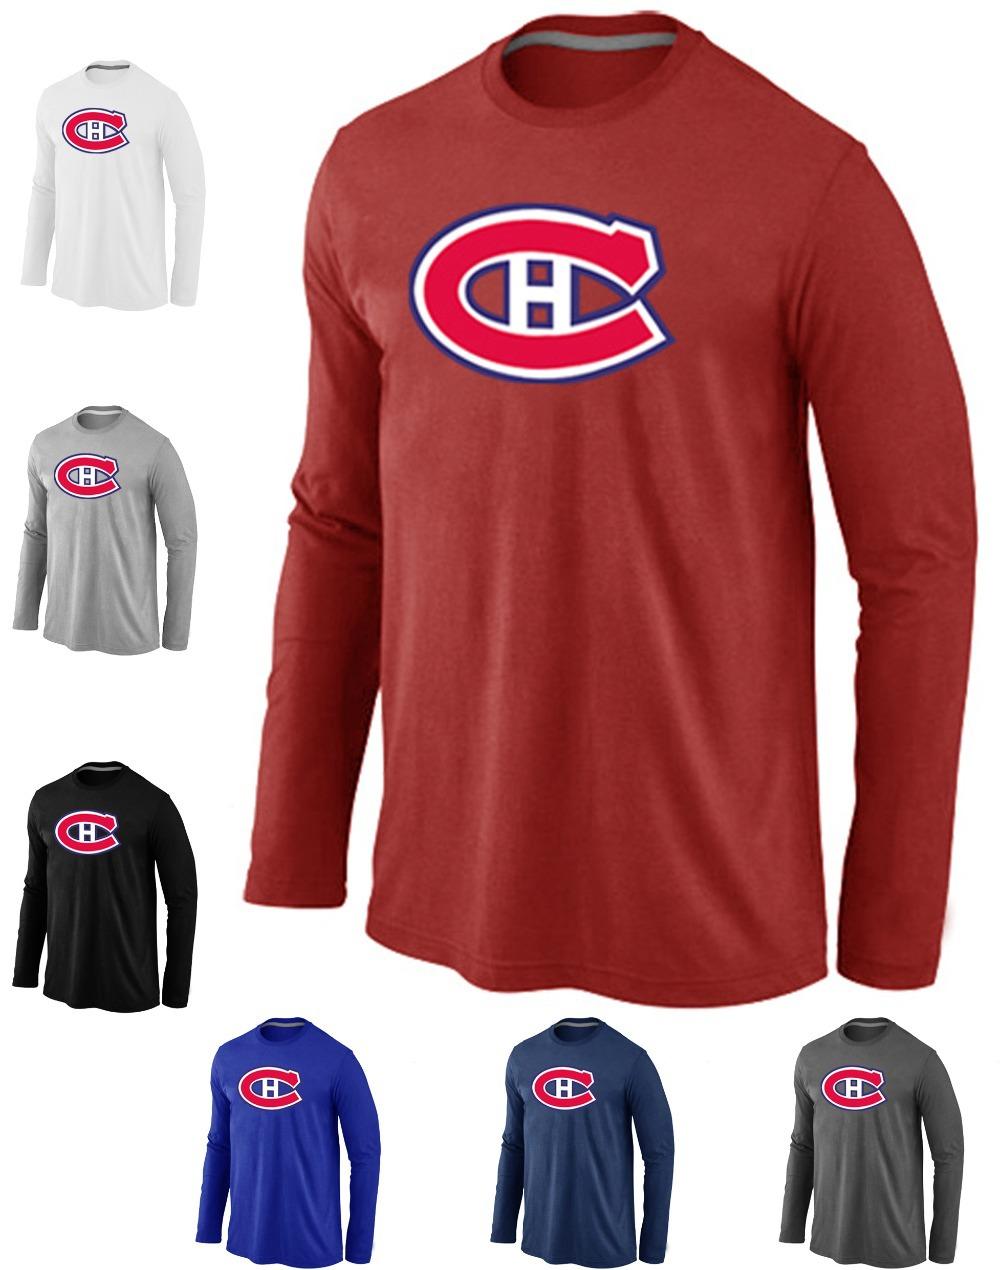 Cheap Montreal Canadiens Hockey Long Sleeve T Shirts Big&Tall Logo Fashion Canadiens Hockey Tees Shirt Cotton O-Neck T-shirt(China (Mainland))